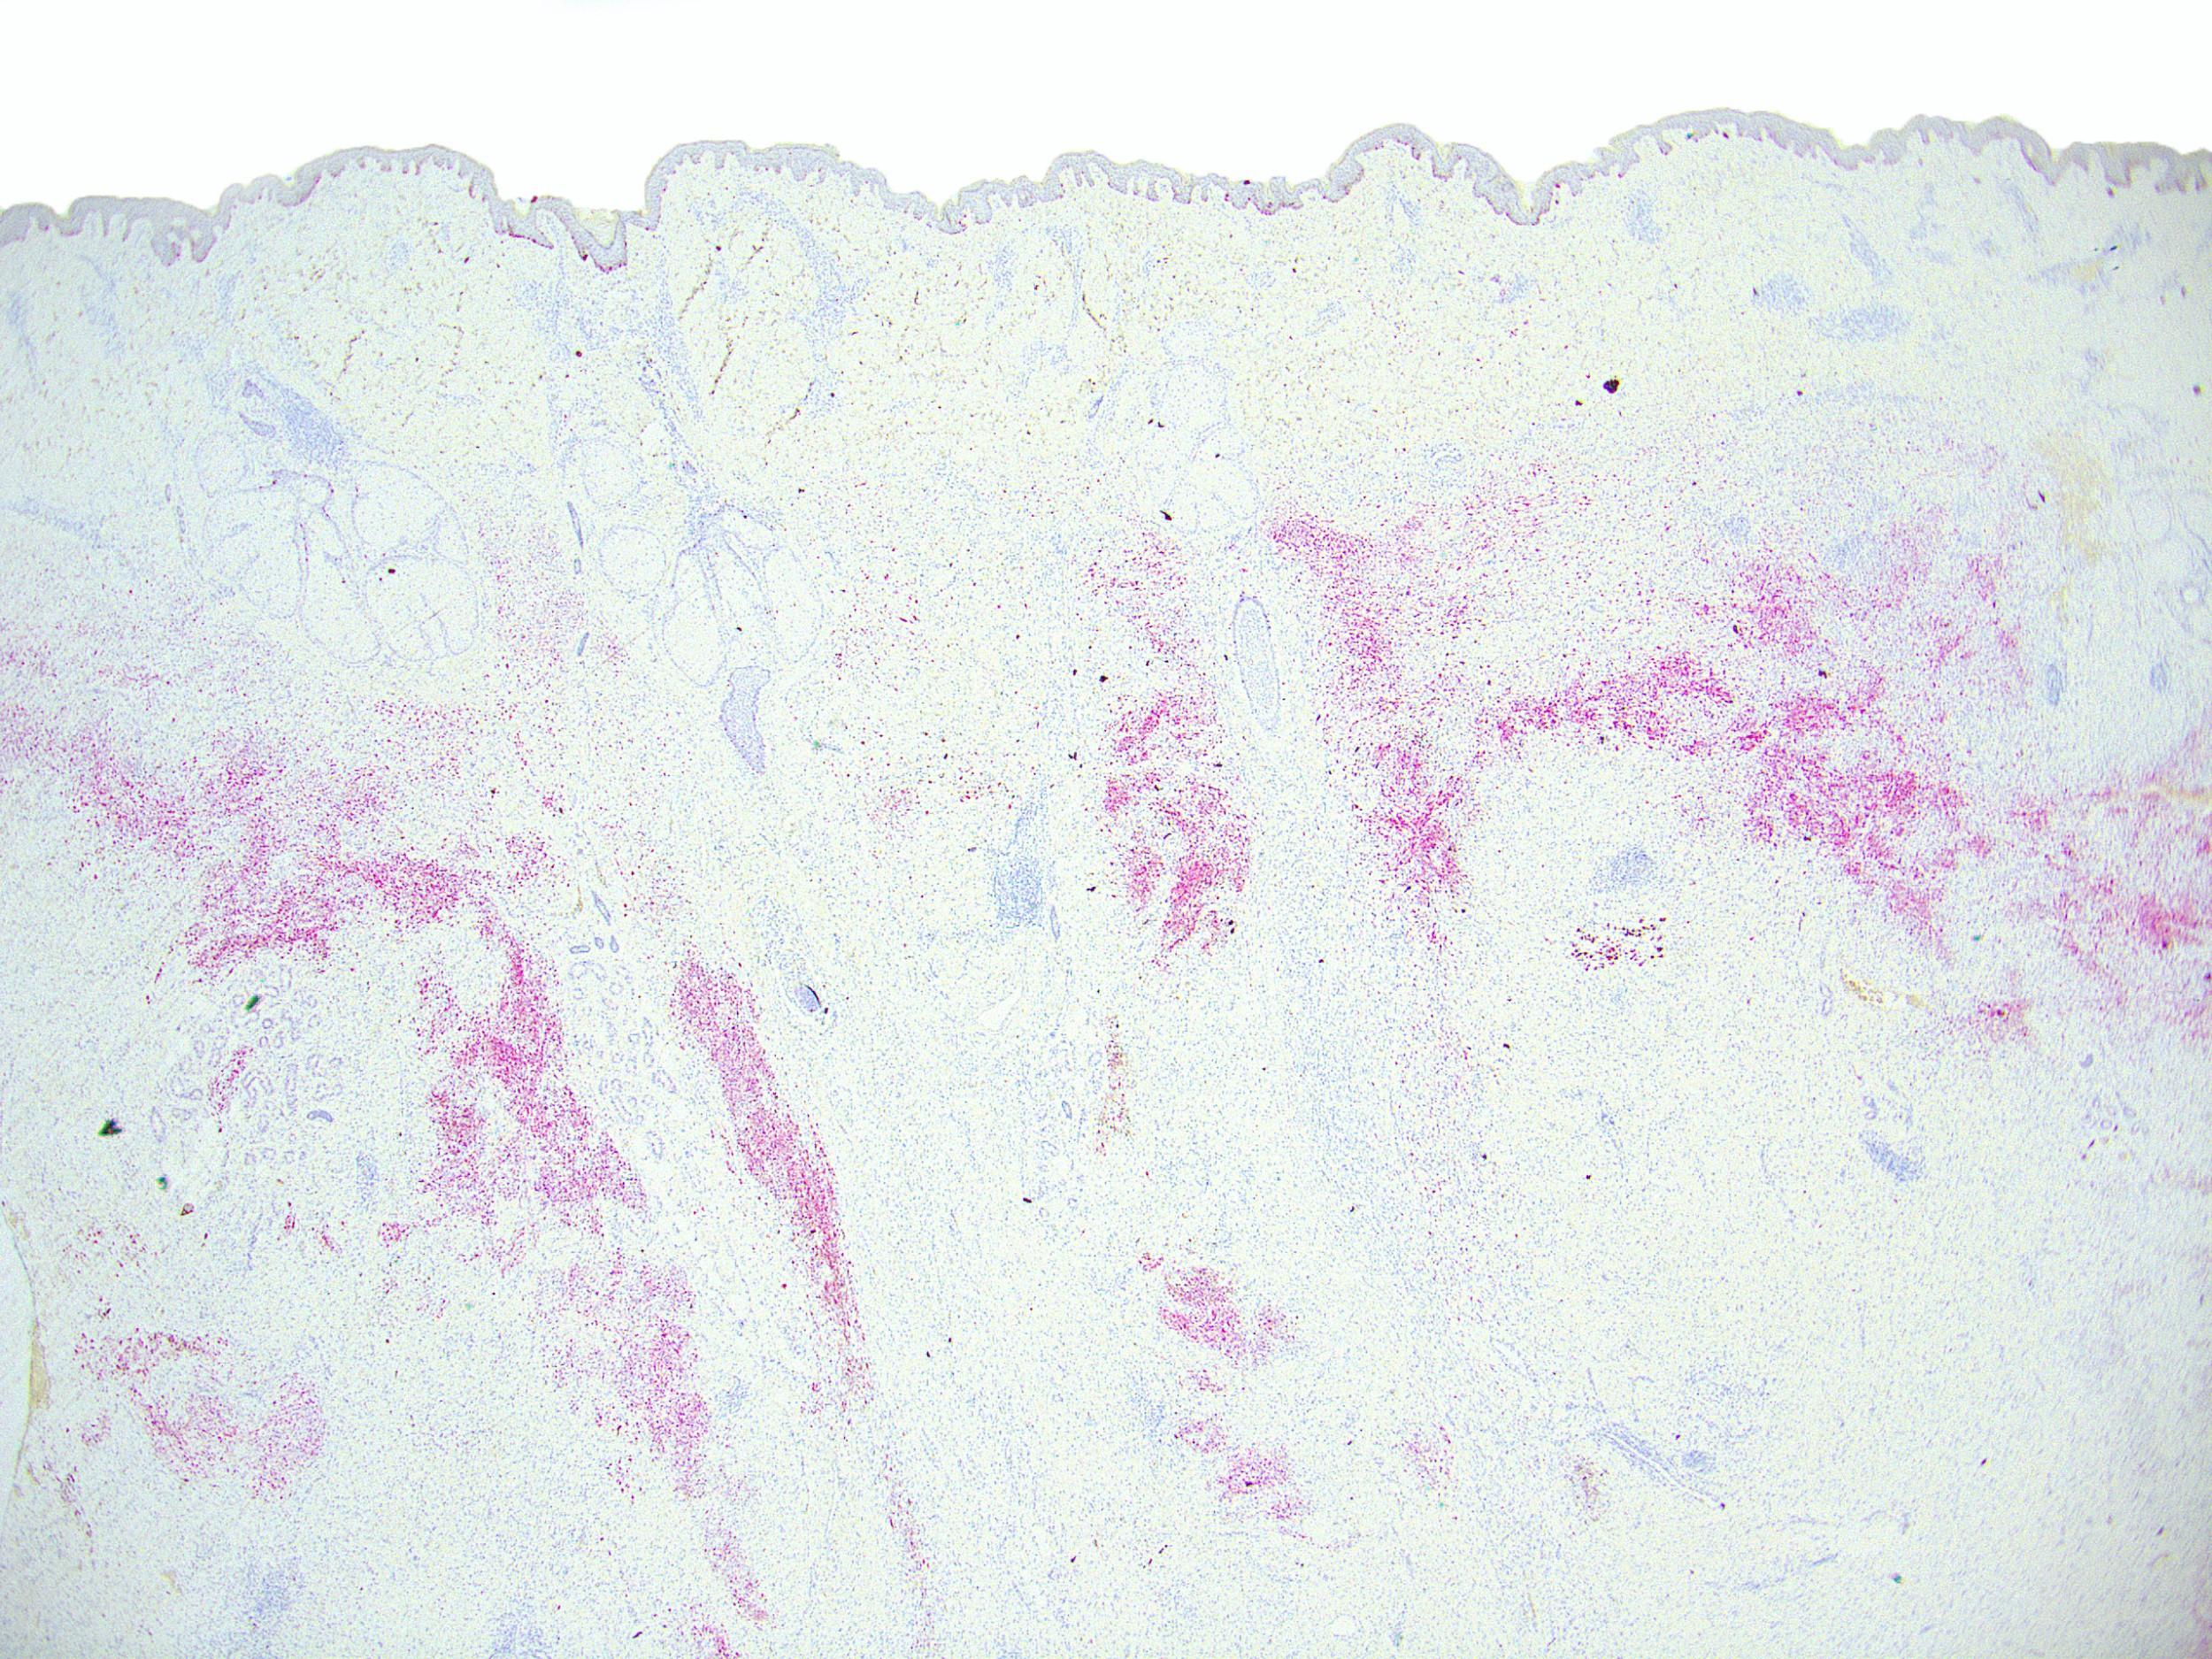 Neurocristic hamartoma MelanA